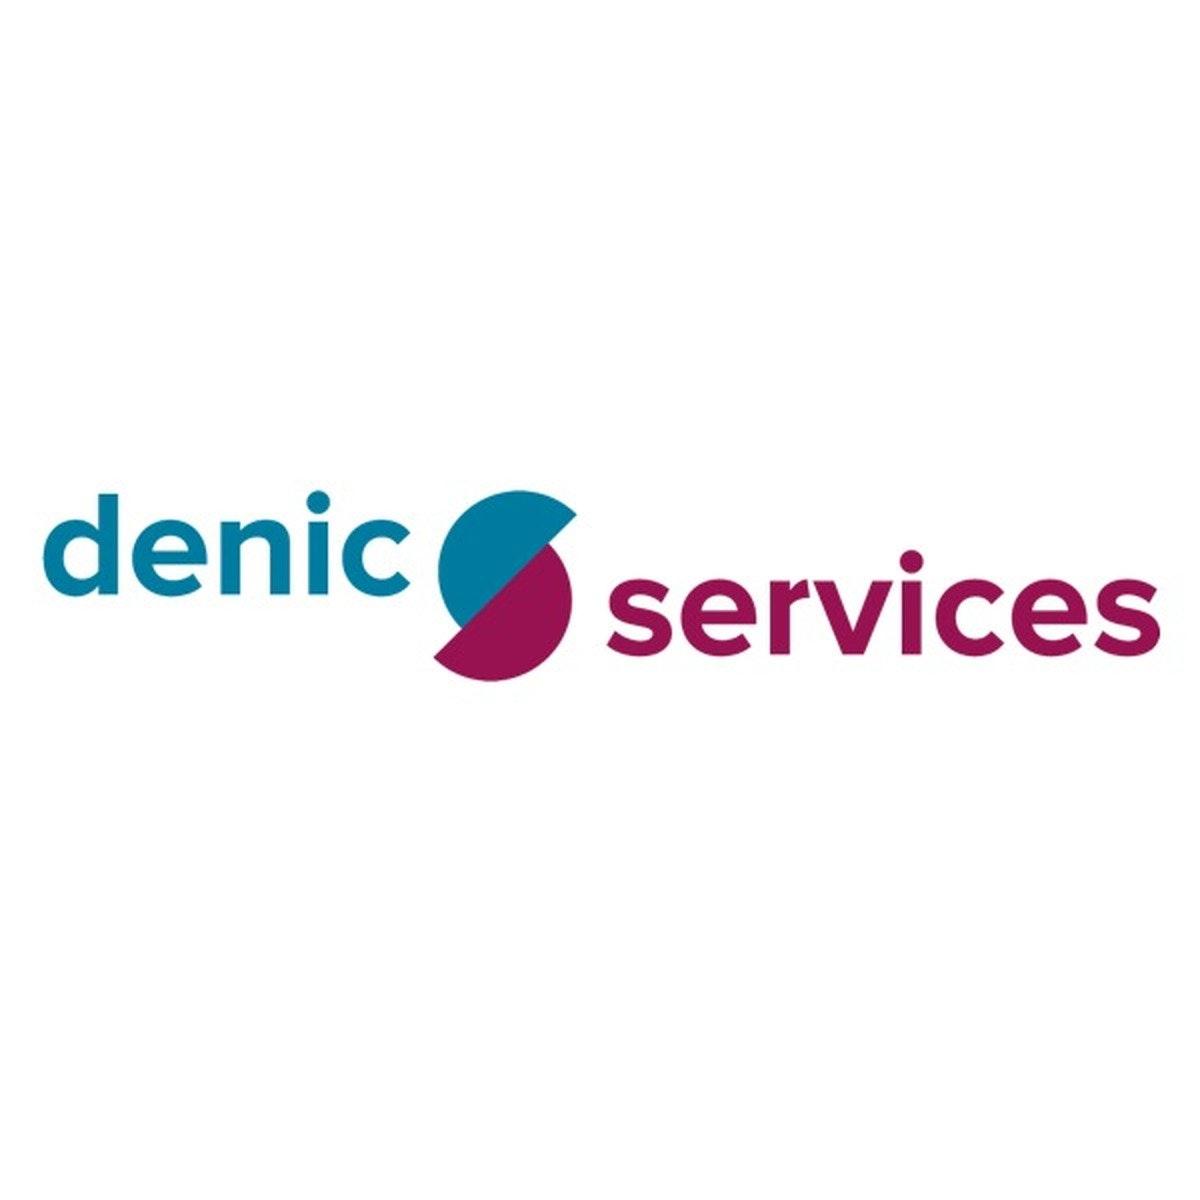 DENIC Services GmbH & Co. KG